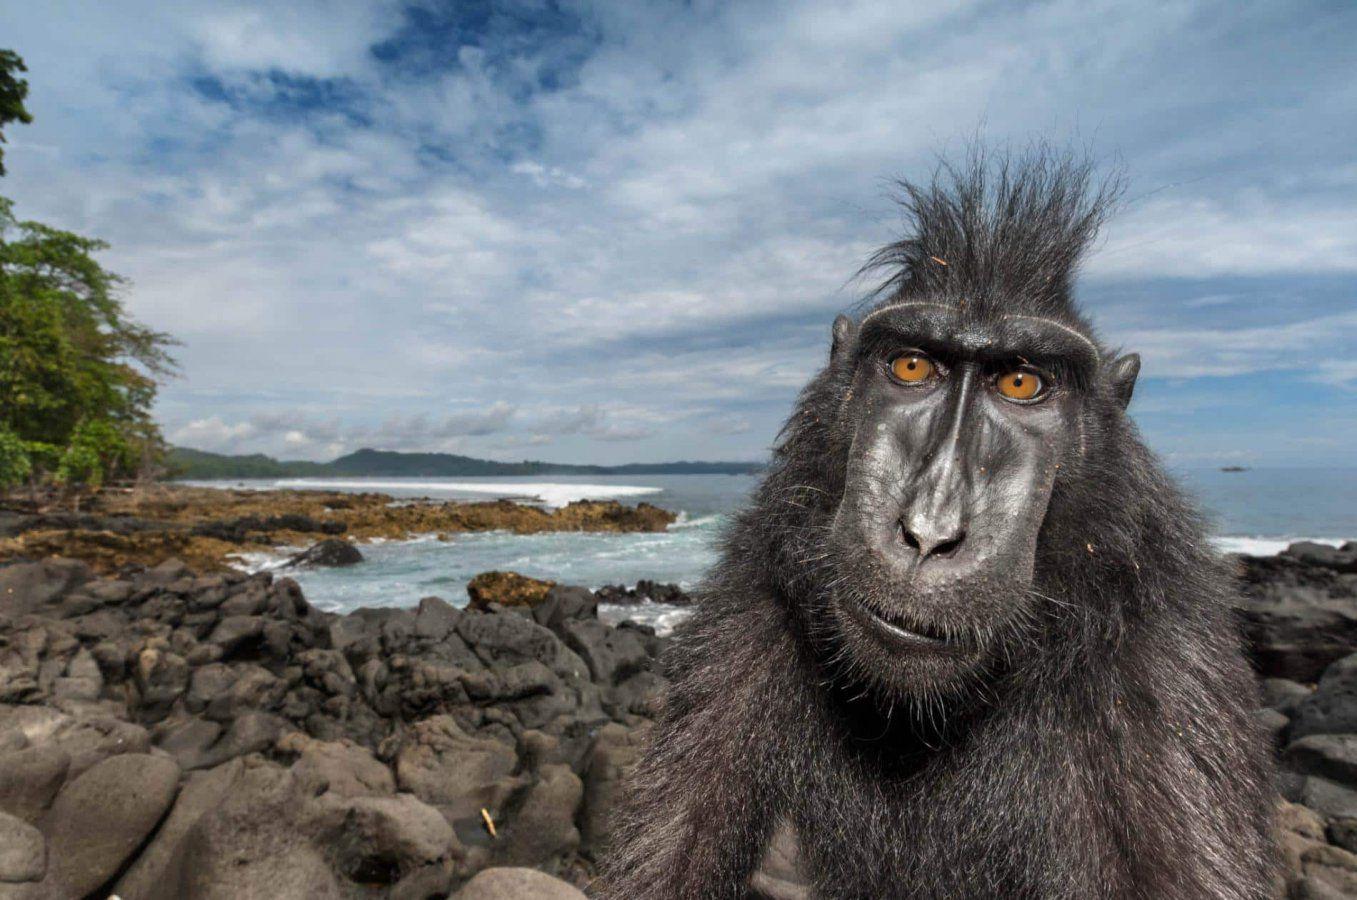 14-macaque-ocean-sulawesi-reserve-beachside_CROPPED.ngsversion.1486662948948.adapt.1900.1.jpg